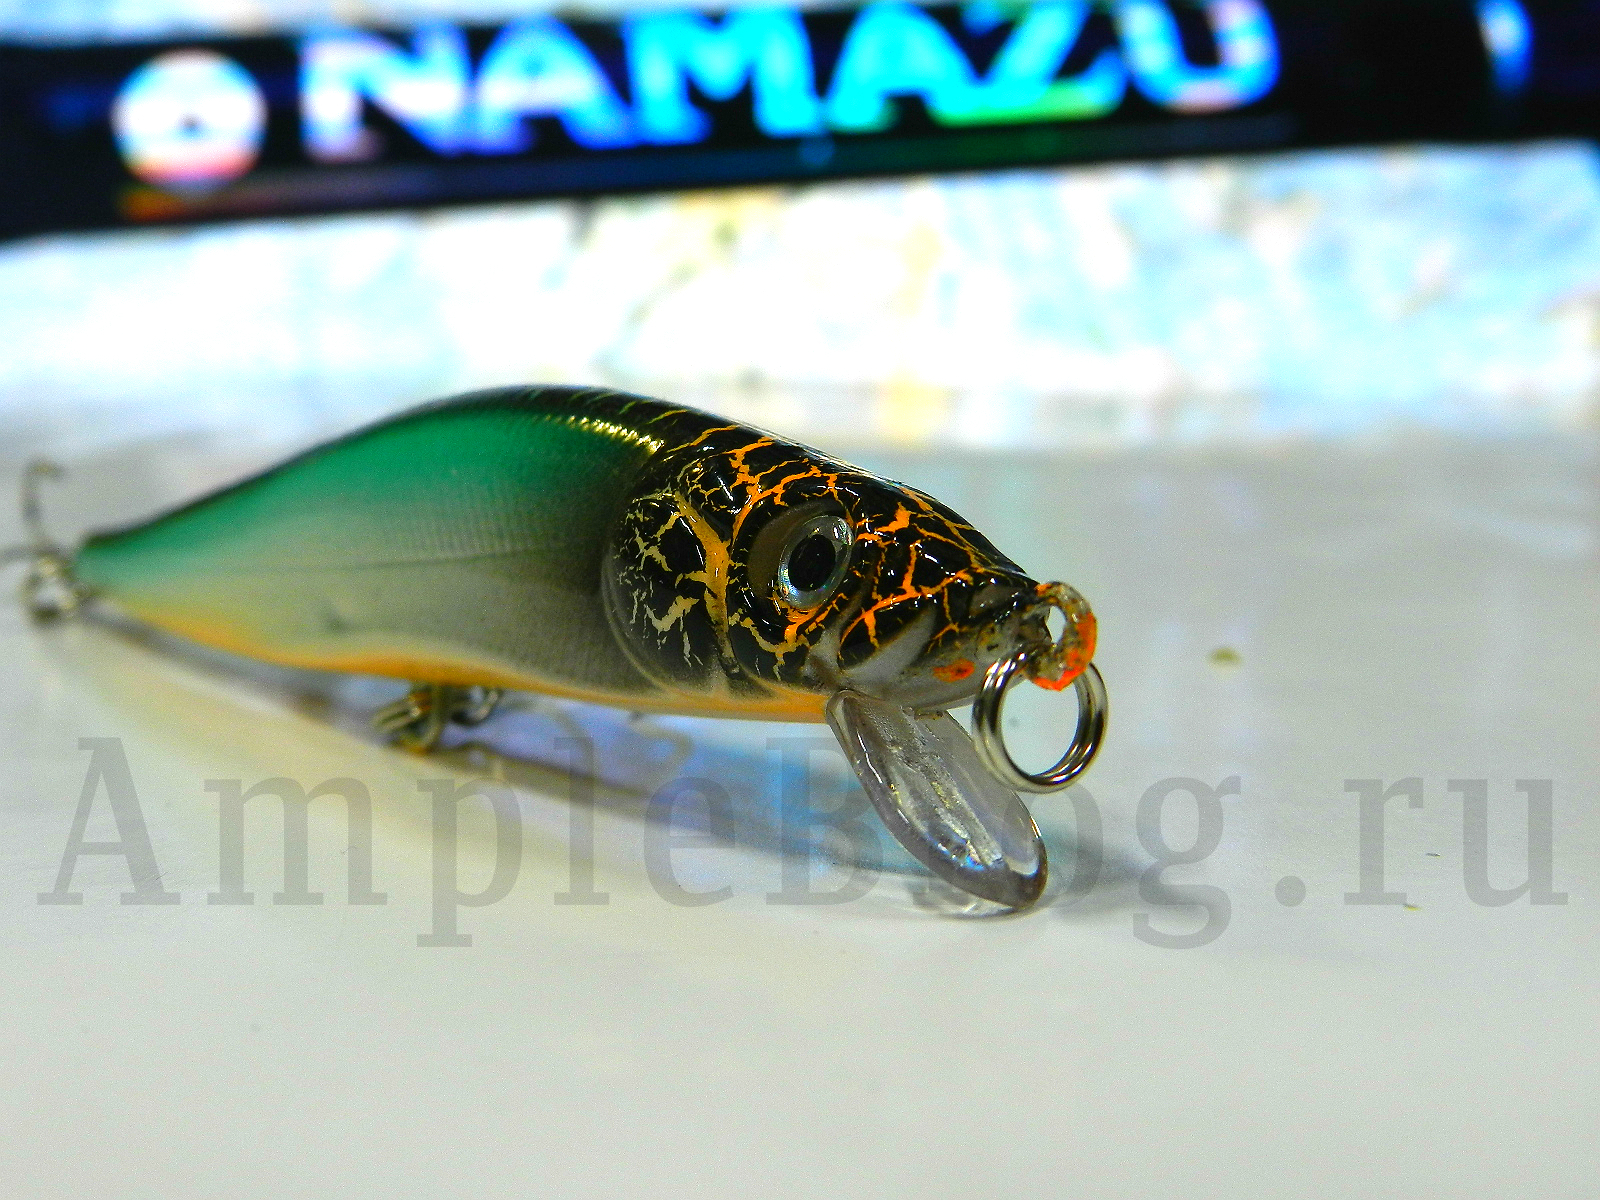 http://ampleblog.ru/voblery-namazu/